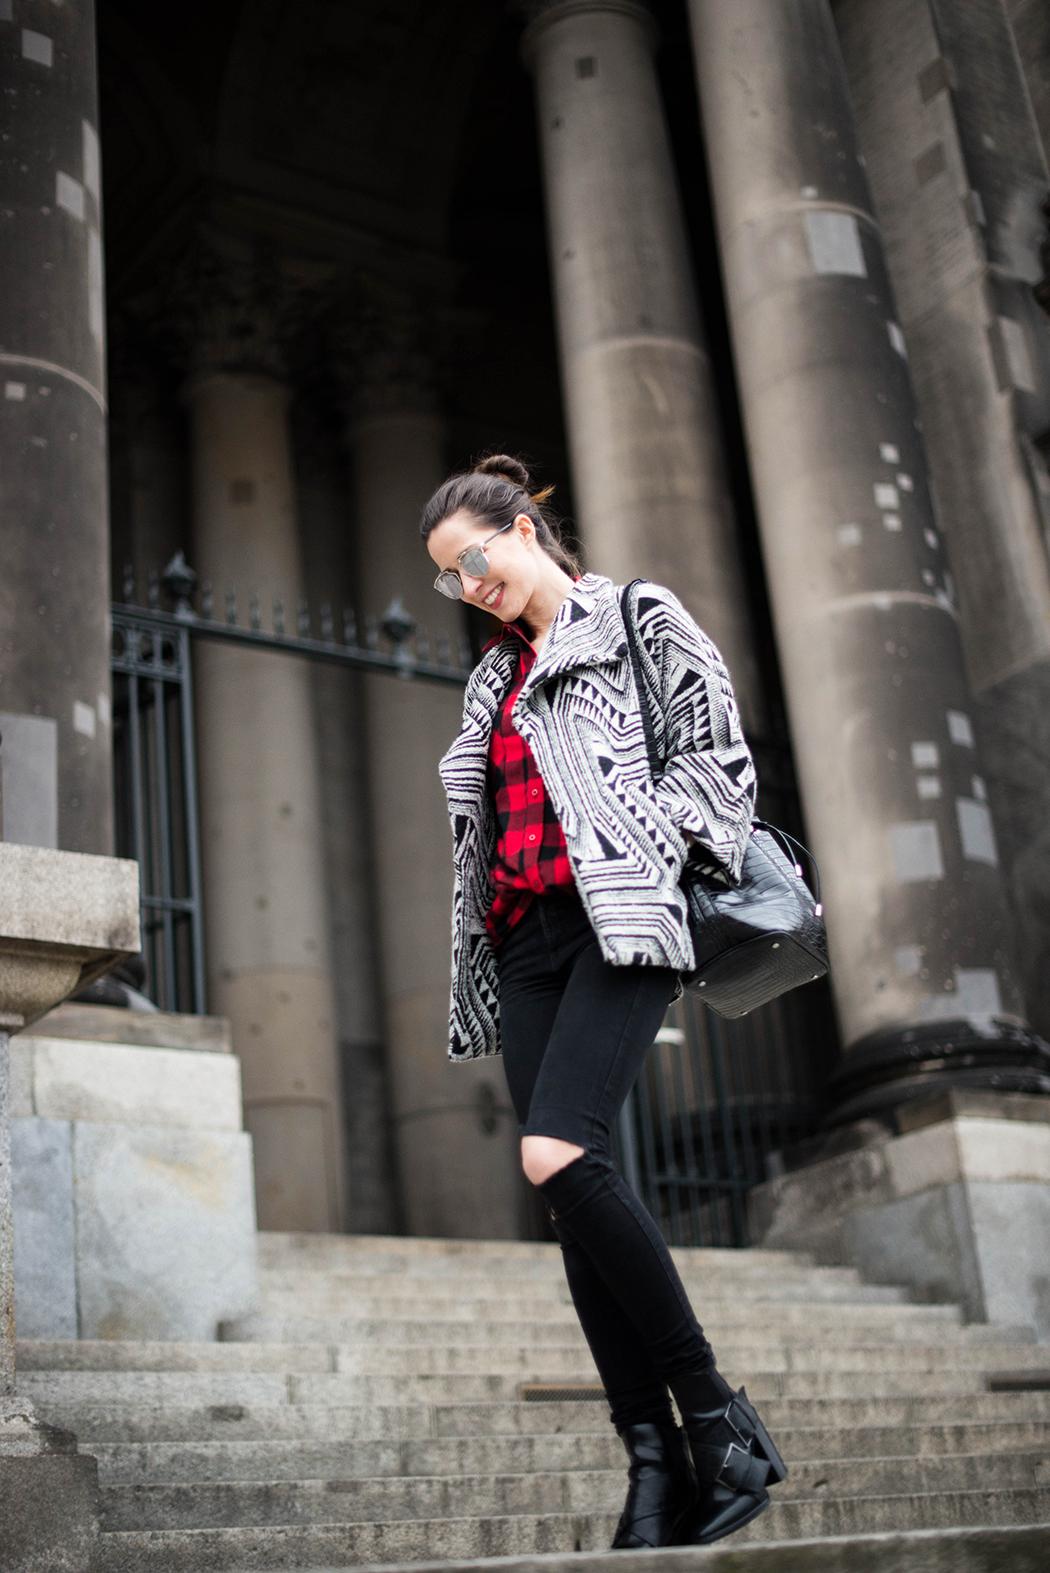 Levis-501-Berlin-Fashionblog-Deutschland-München-Fashionblogger-Bloggerevent-Lindarella-12